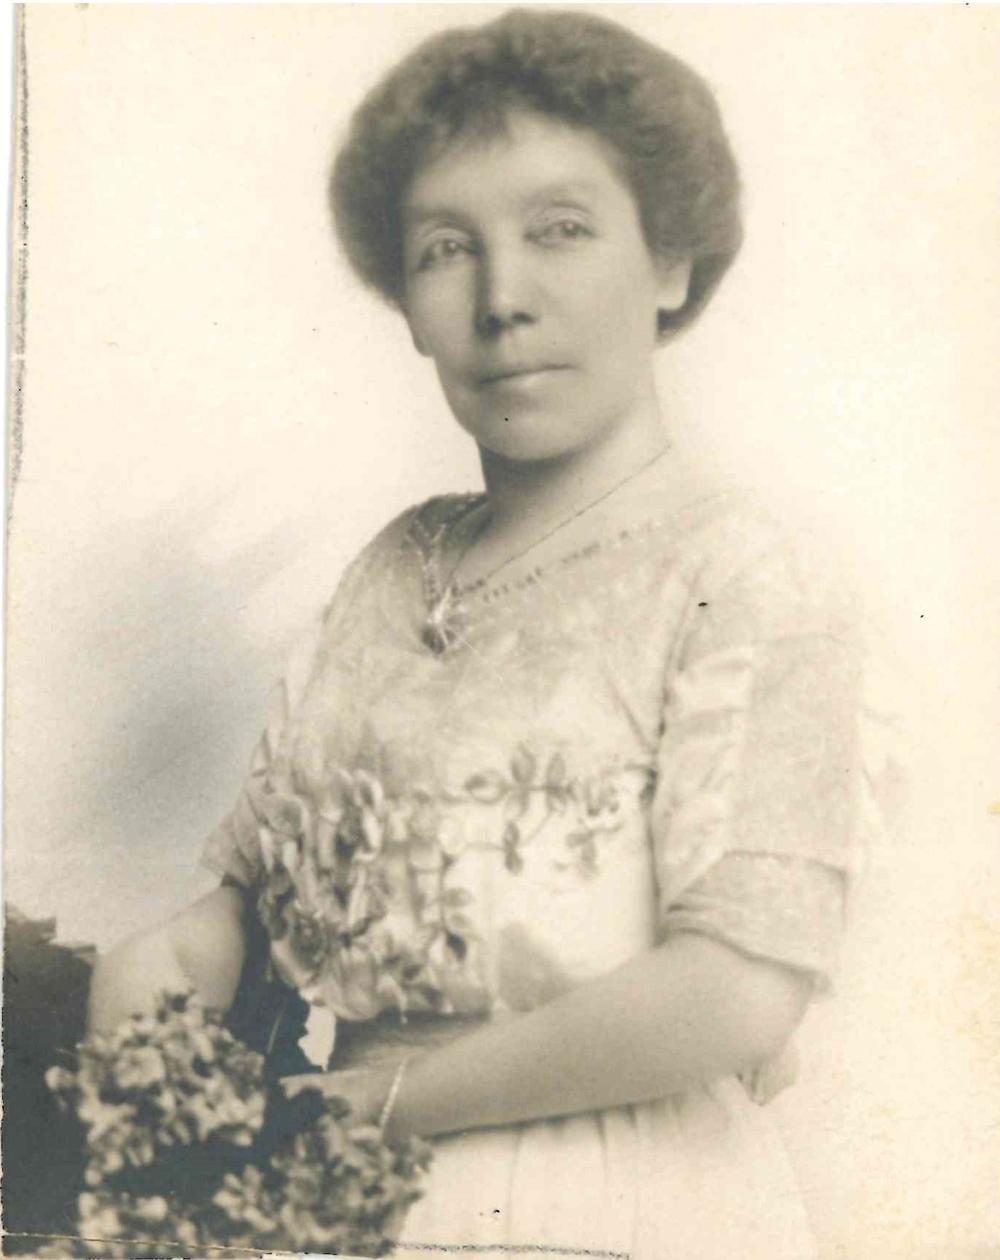 Photo of Isabella Lougheed, holding flowers.